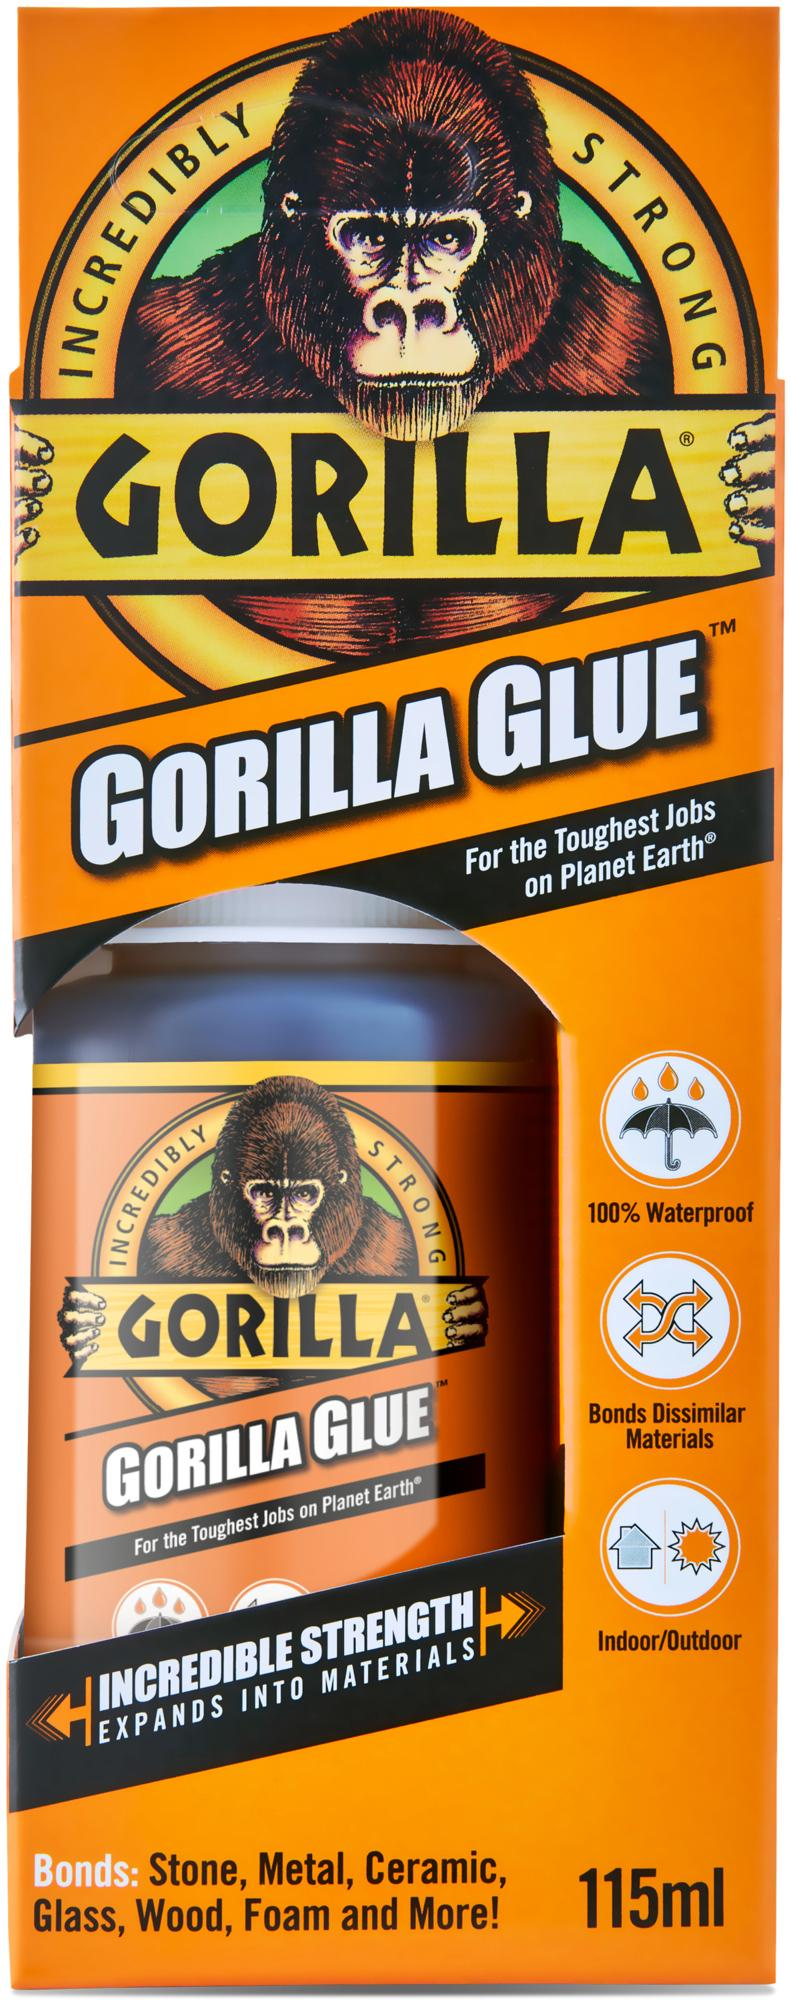 Gorilla Glue 115Ml lowest price